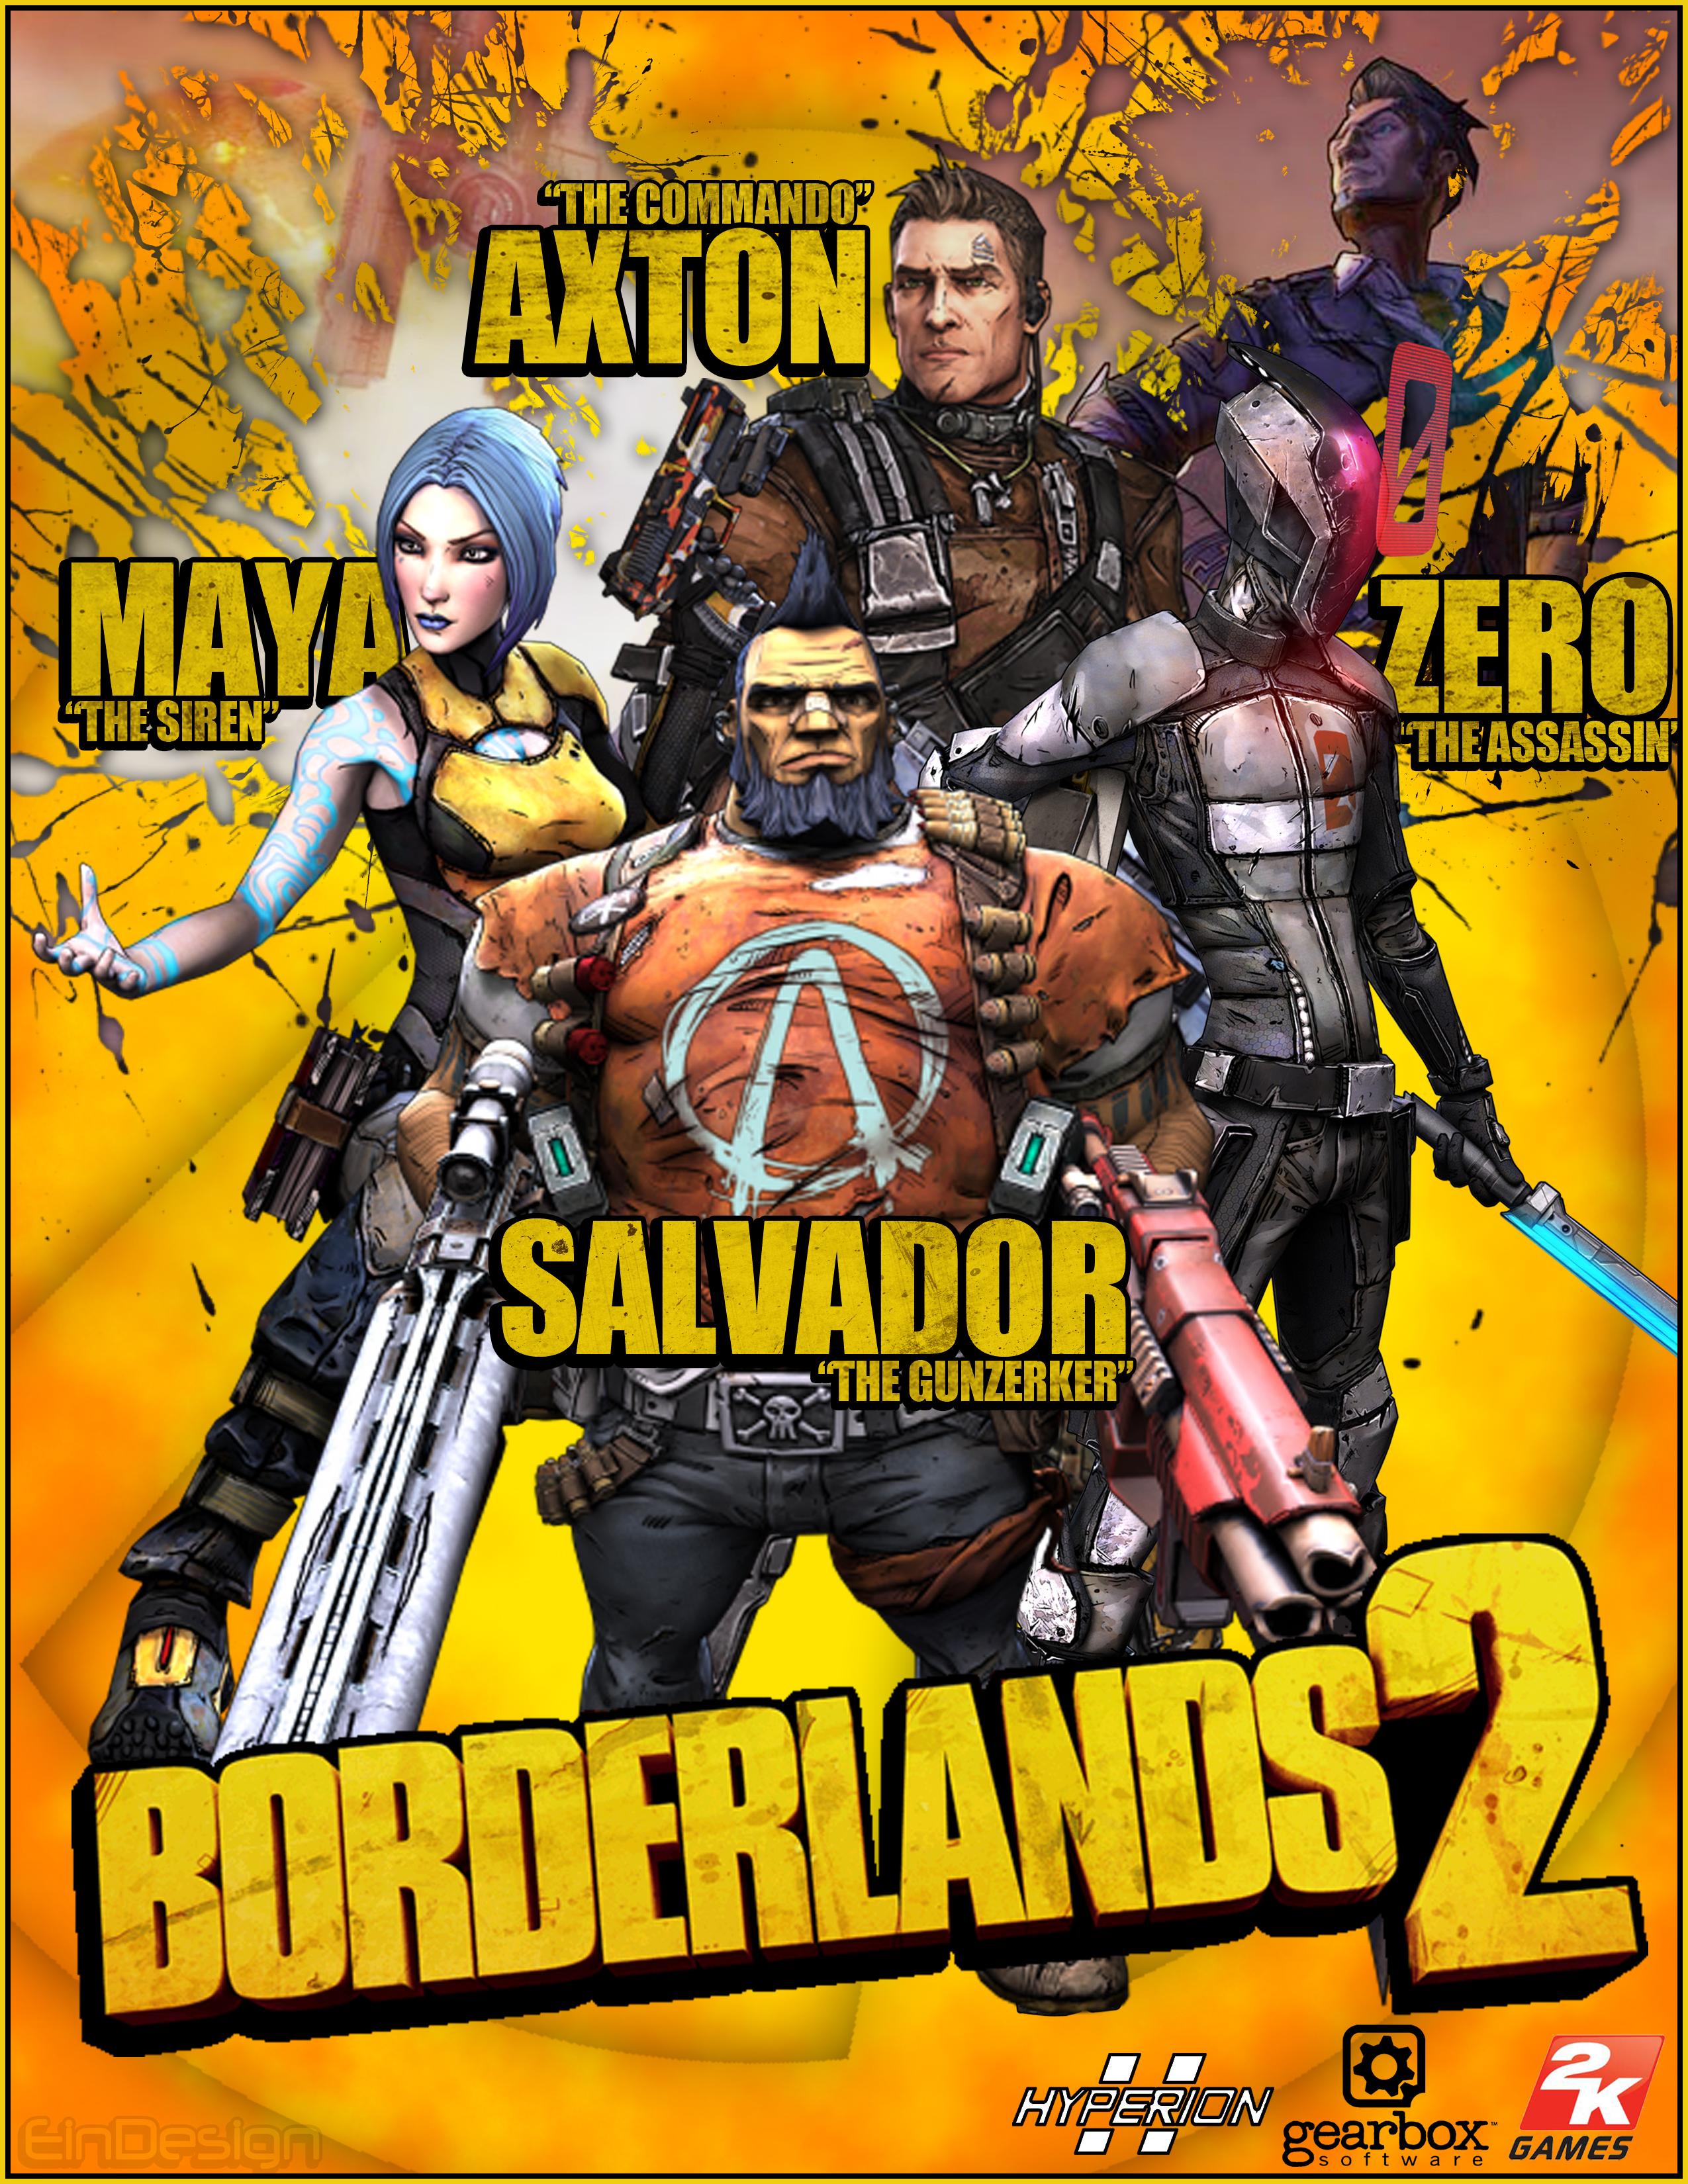 Borderlands 2 poster by theein on deviantart - Borderlands 3 box art wallpaper ...